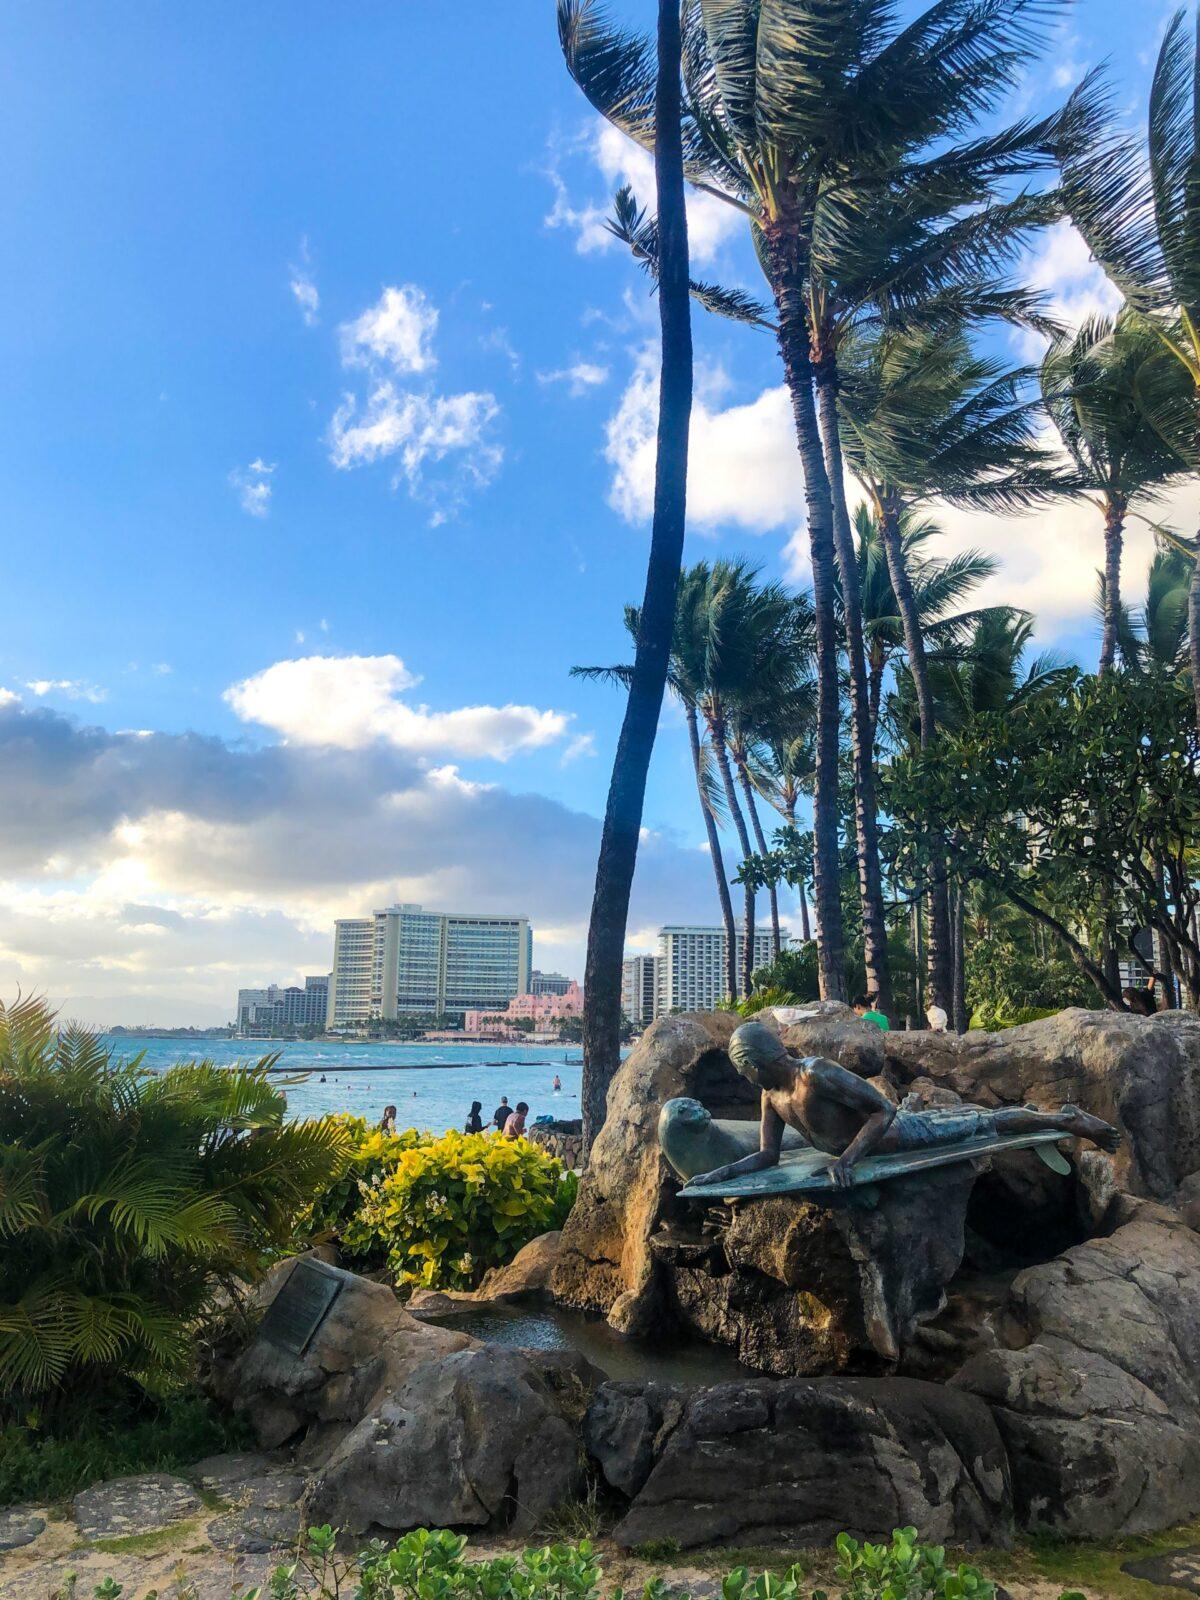 One Week in Waikiki Hawaii Travel Guide